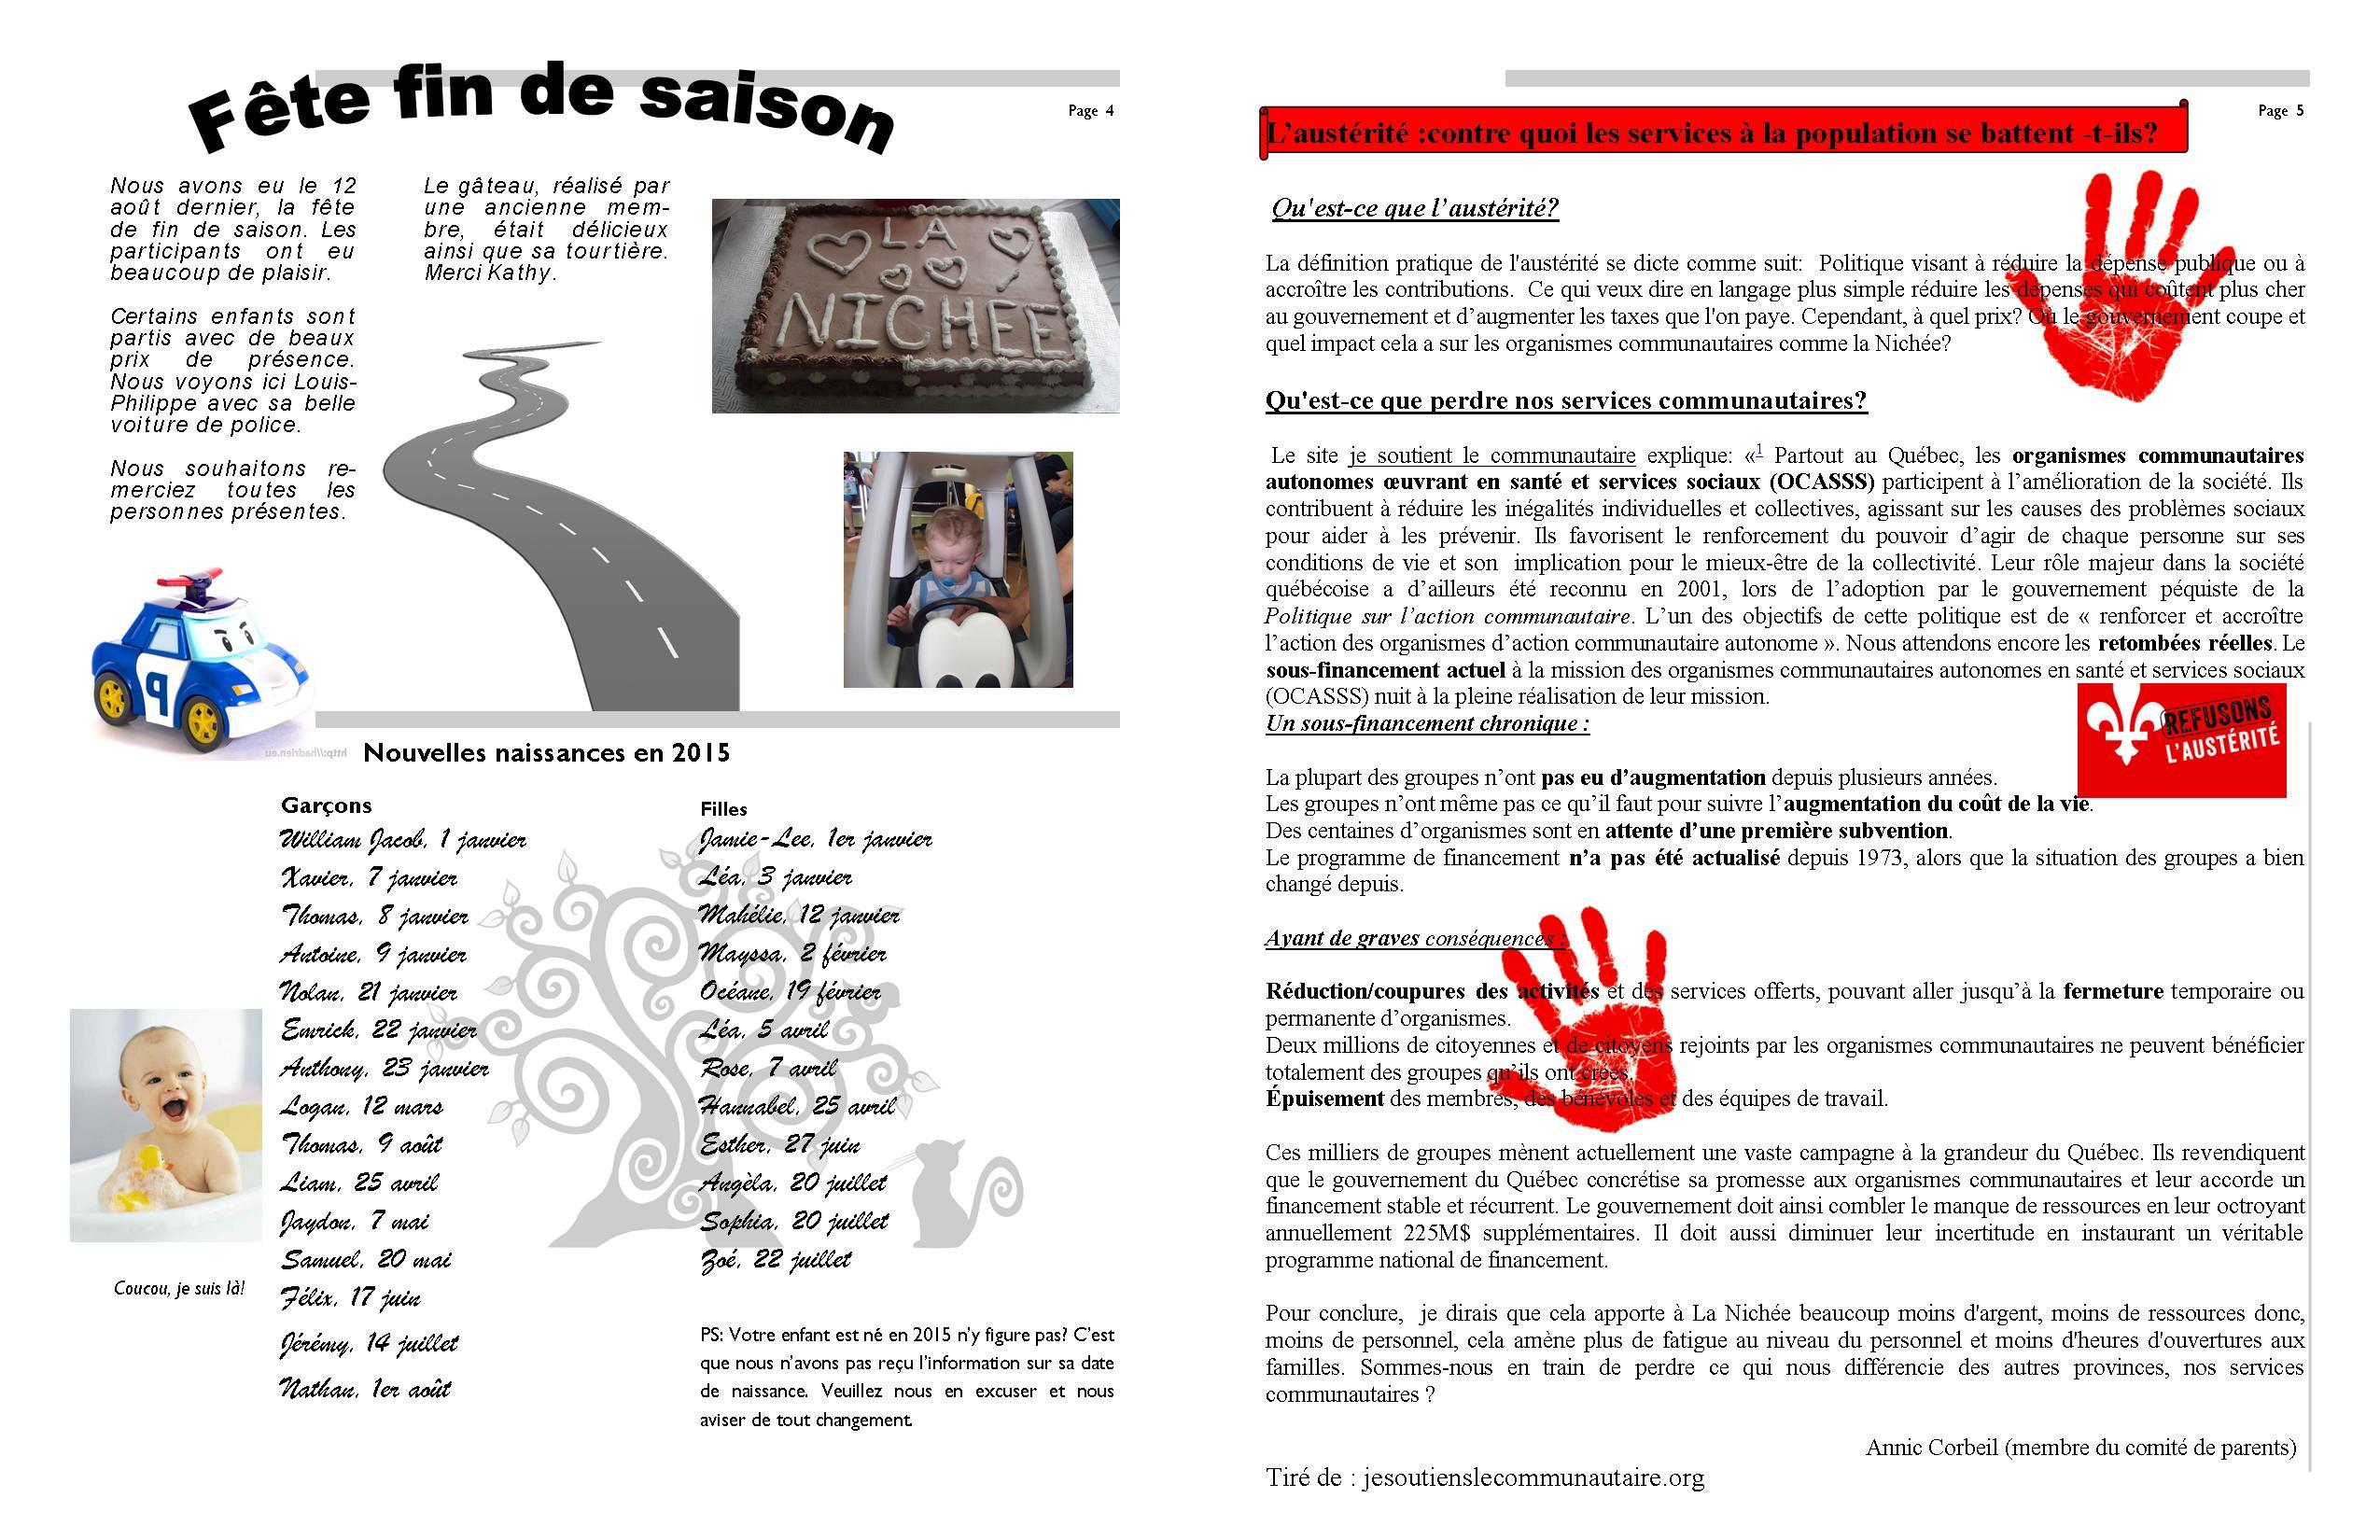 Info-Nichée été-automne 2015 p.4-5